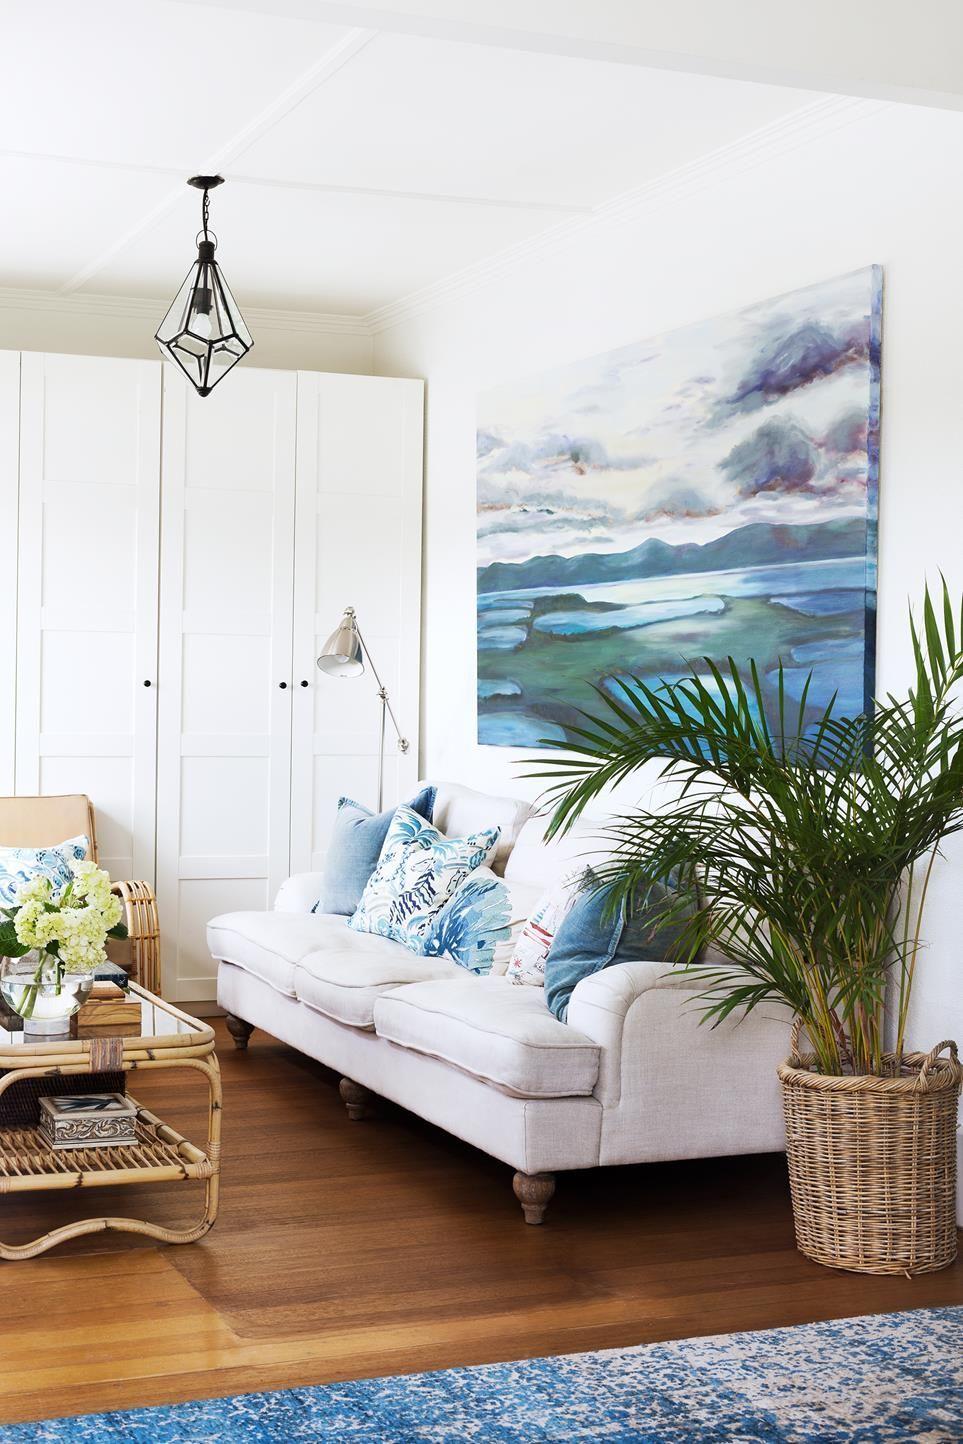 interior designer kate walker of kwd has created a charming hamptons rh pinterest at